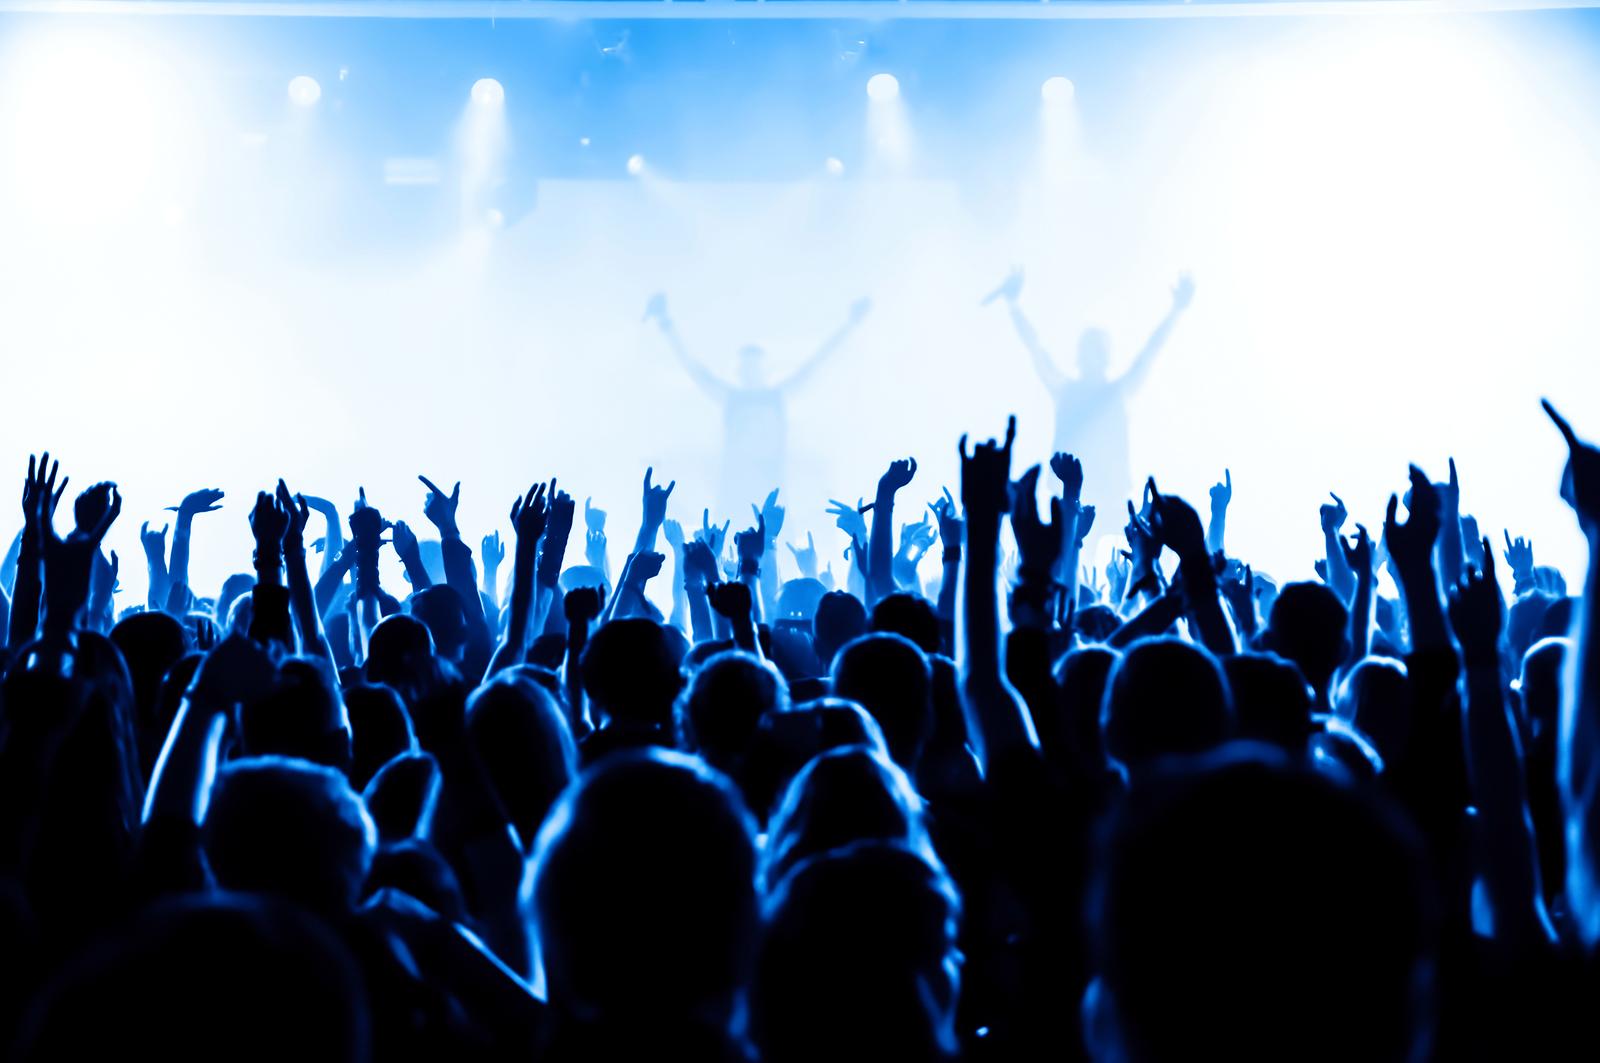 Crowd clipart summer concert Catches concert 862211 Busco up